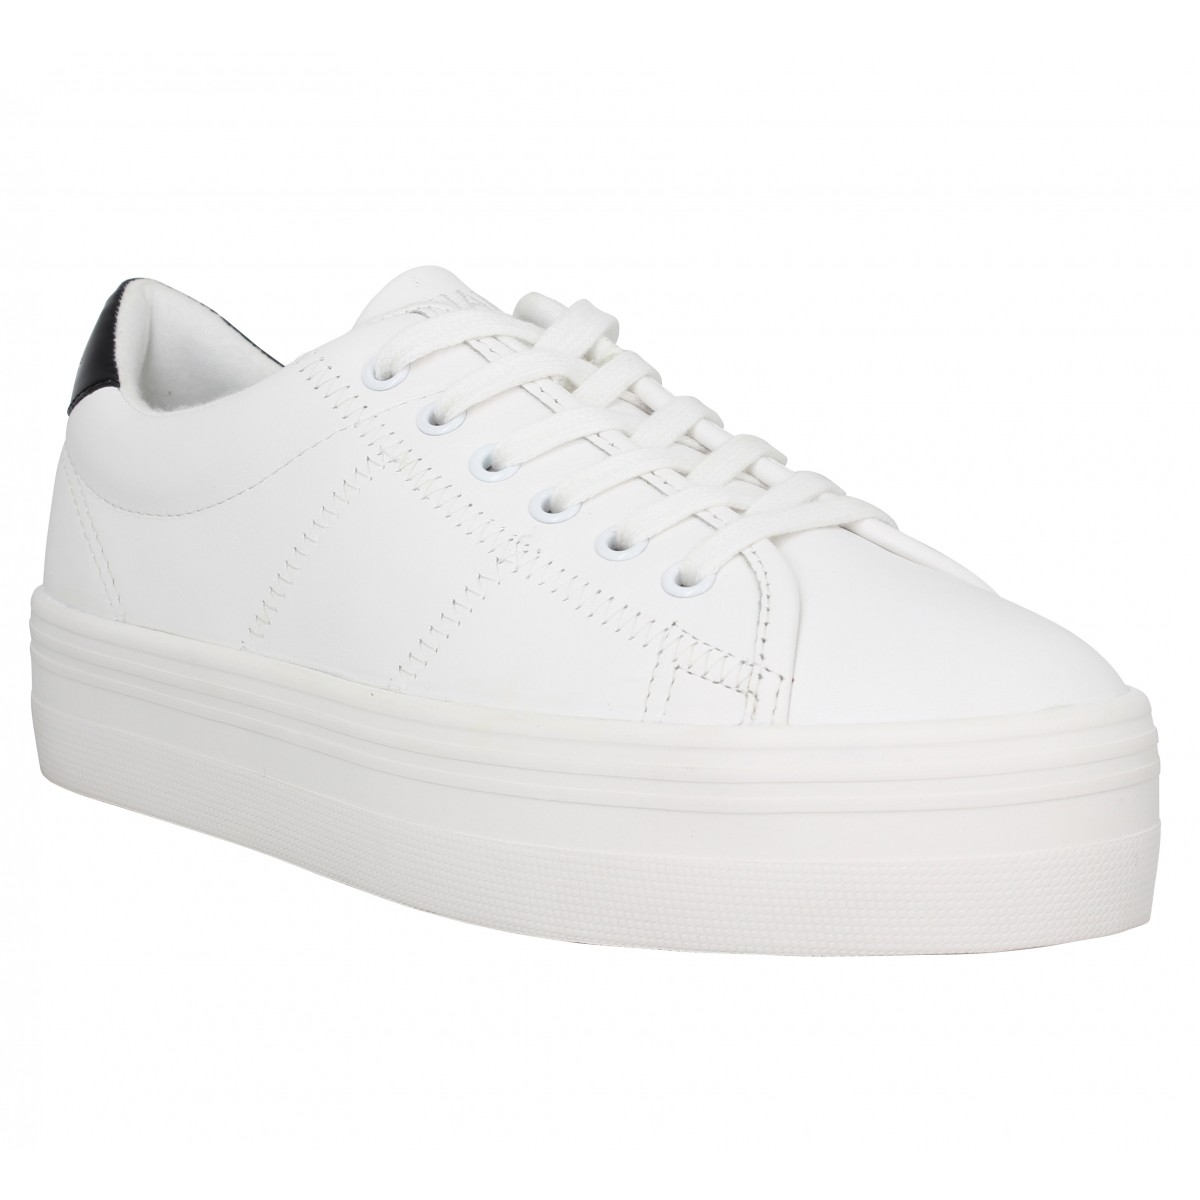 No Name Marque Plato Sneaker Nappa...